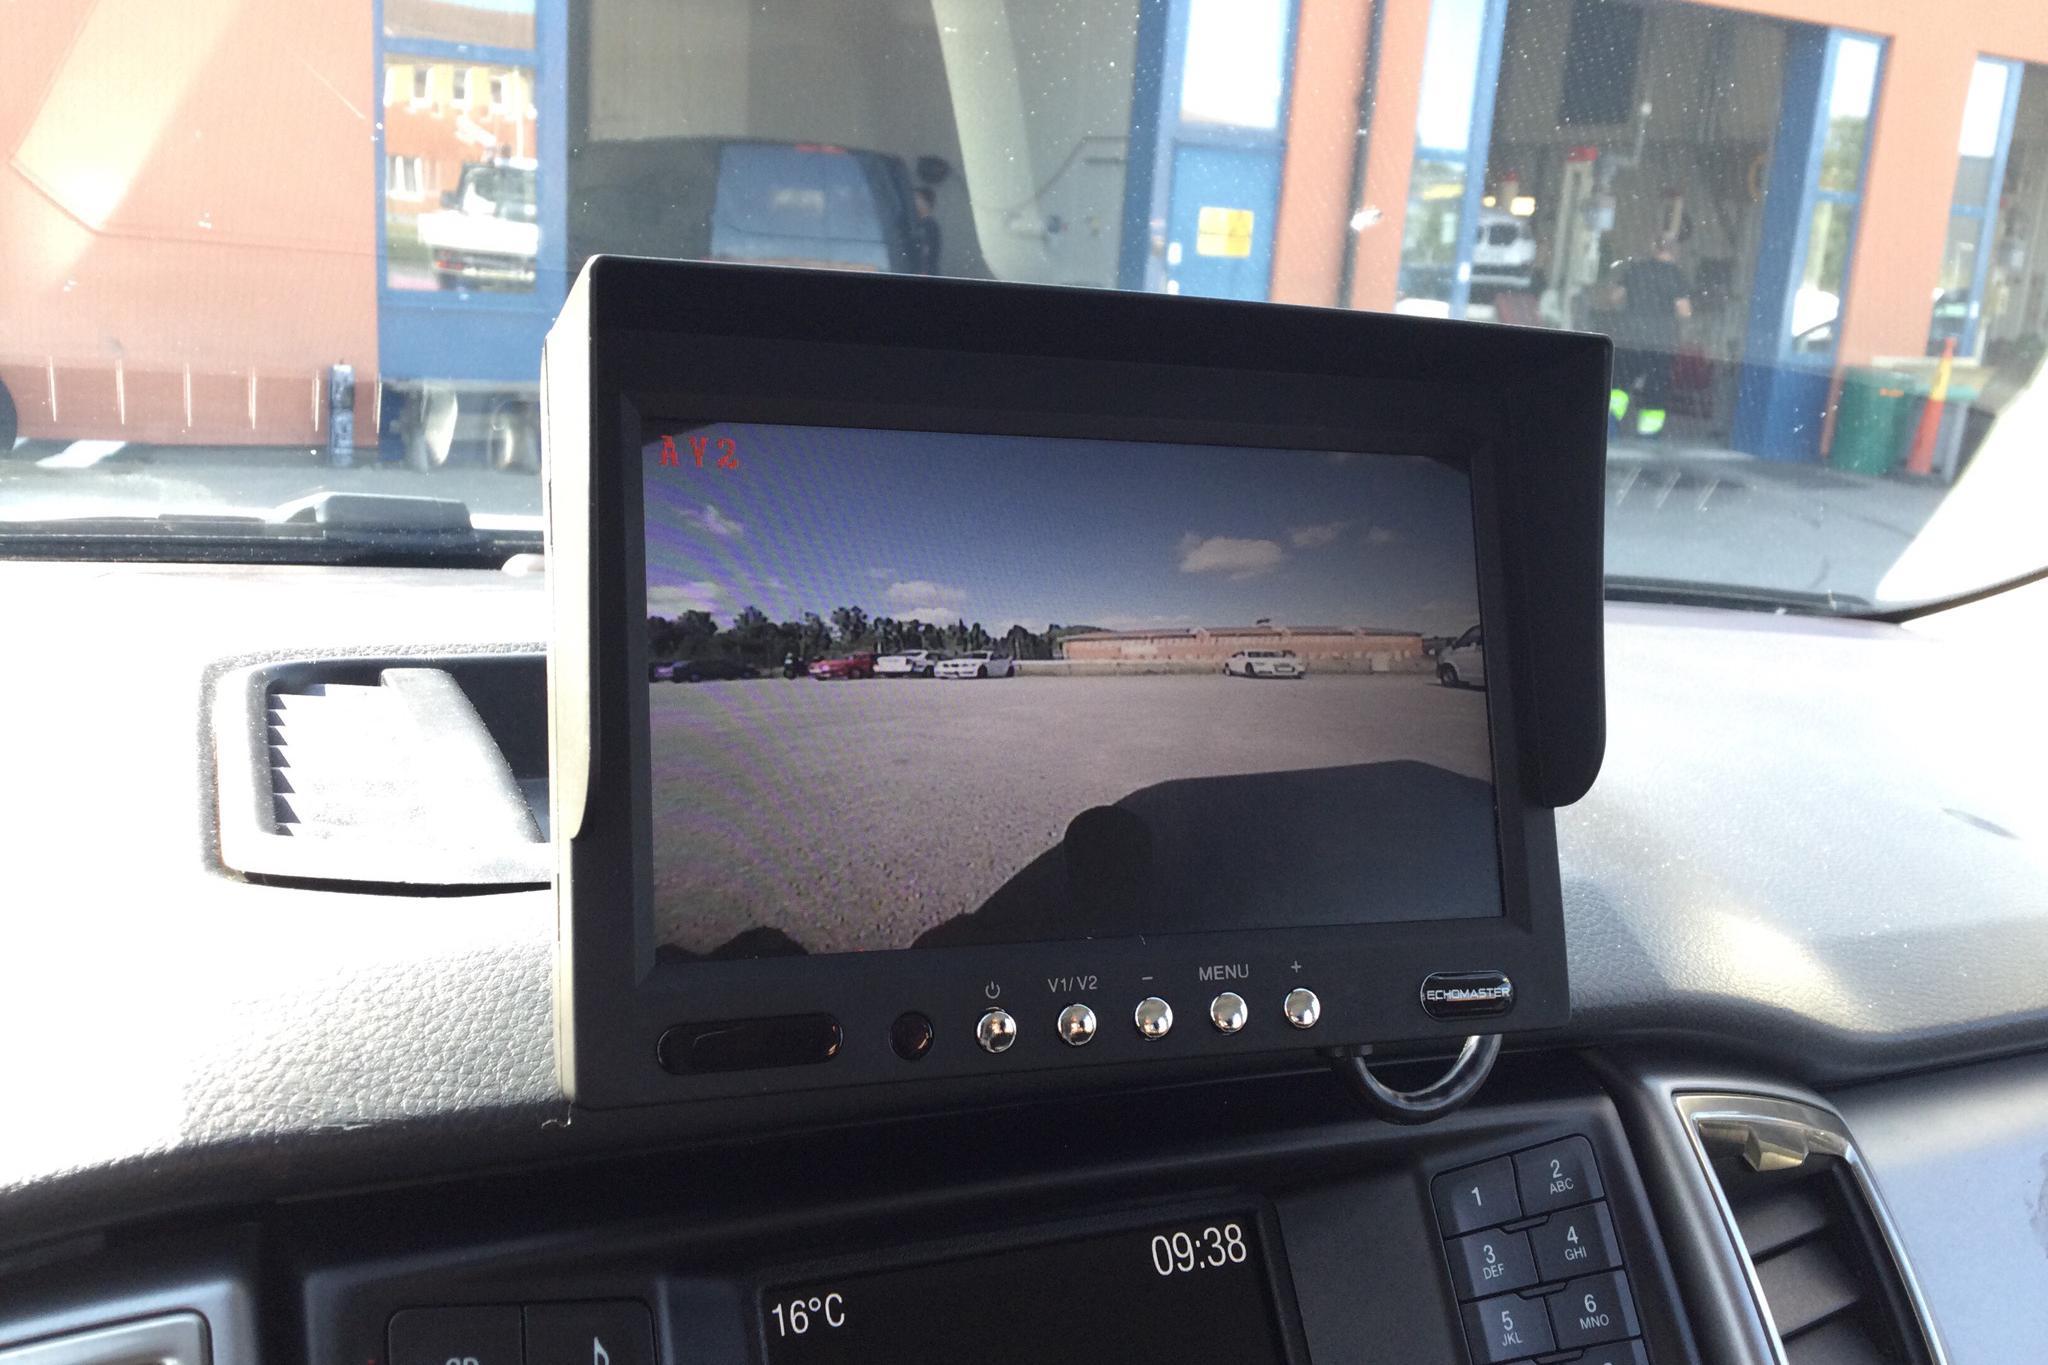 Ford Ranger 2.2 TDCi 4WD (160hk) - 49 630 km - Automatic - white - 2016